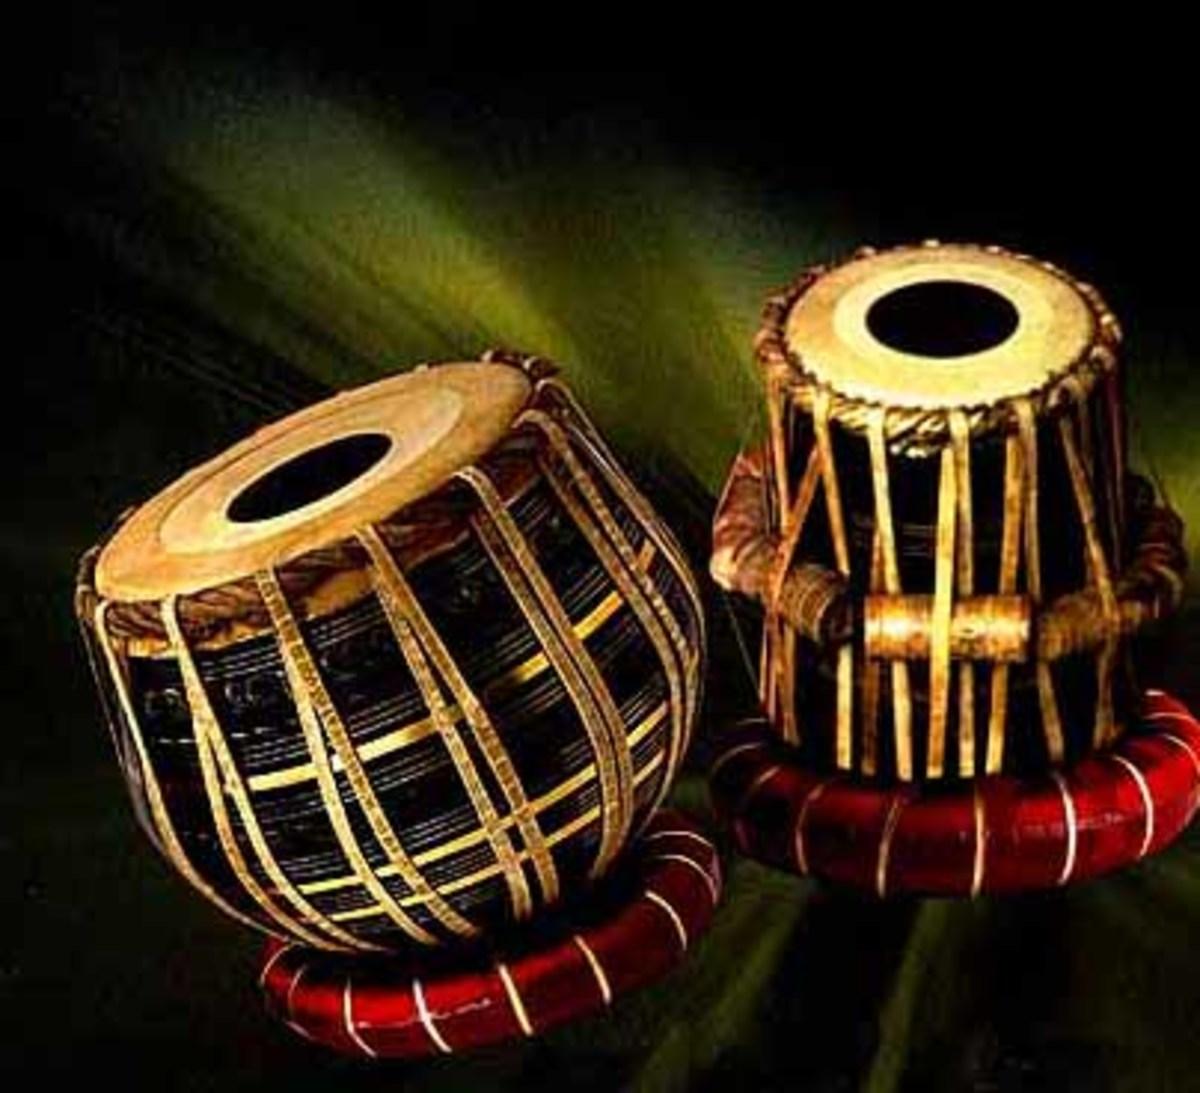 'Tabla' - eastern drums